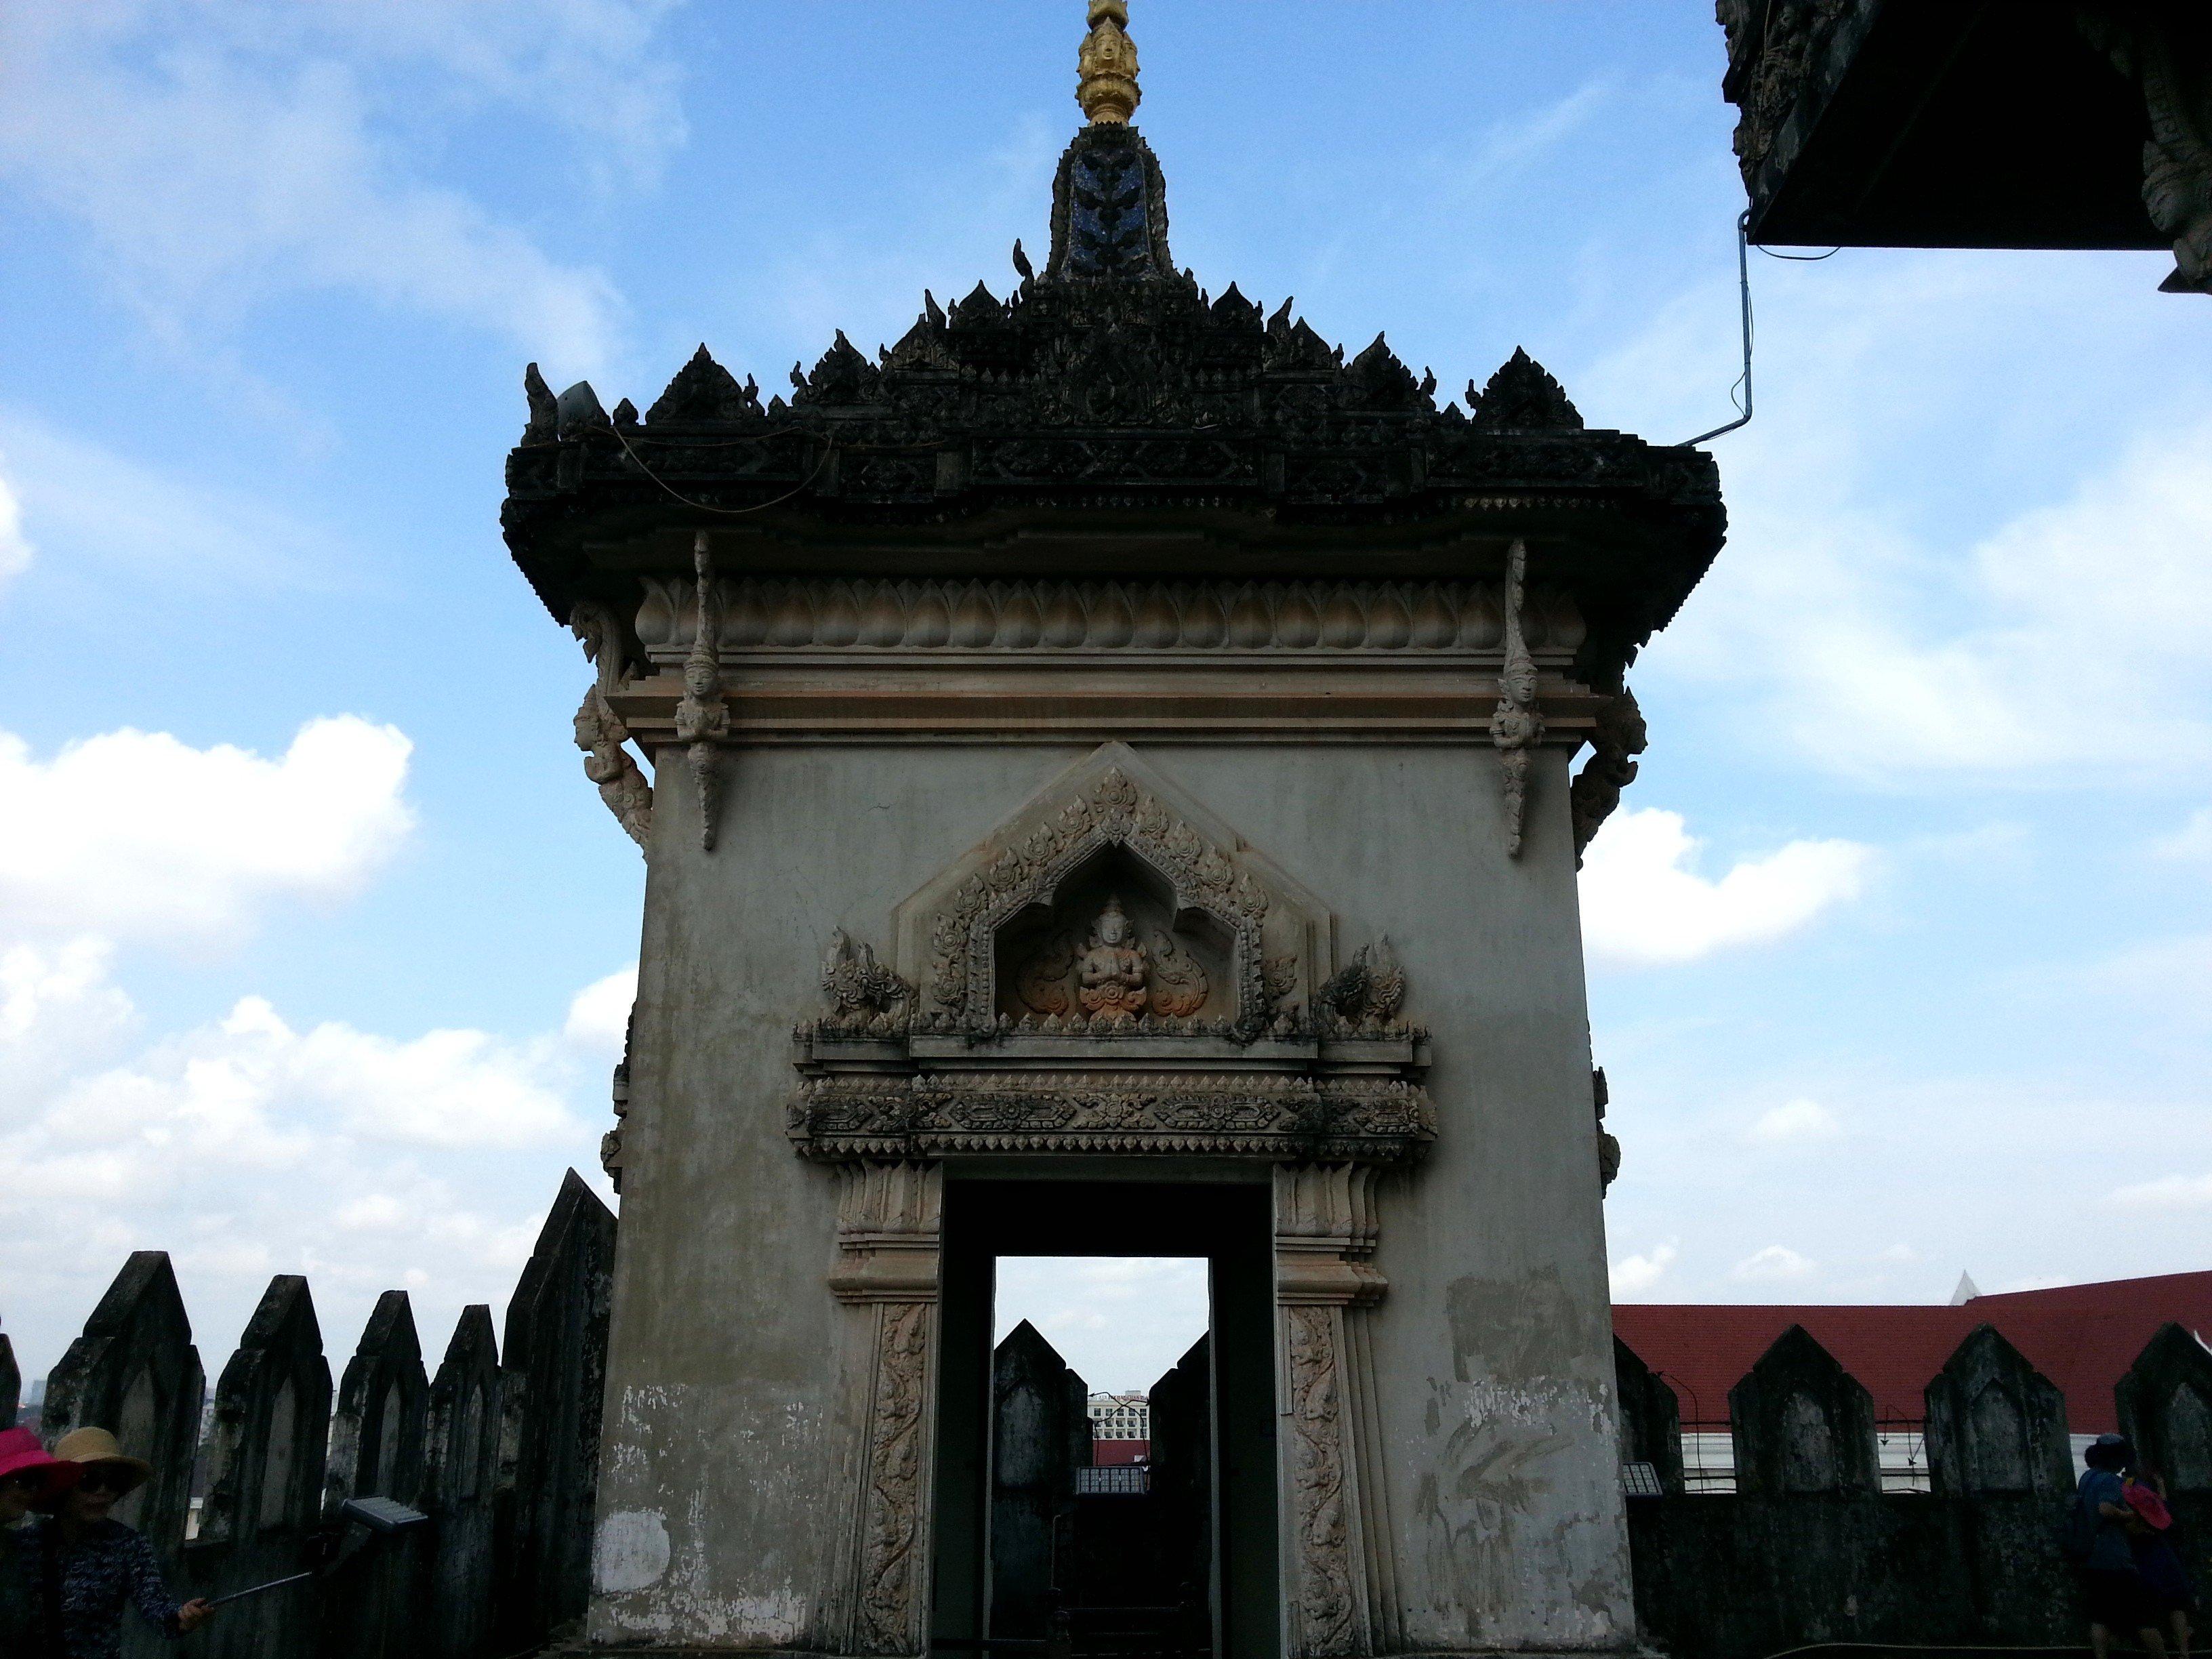 Stupa on top of the Patuxai Monument